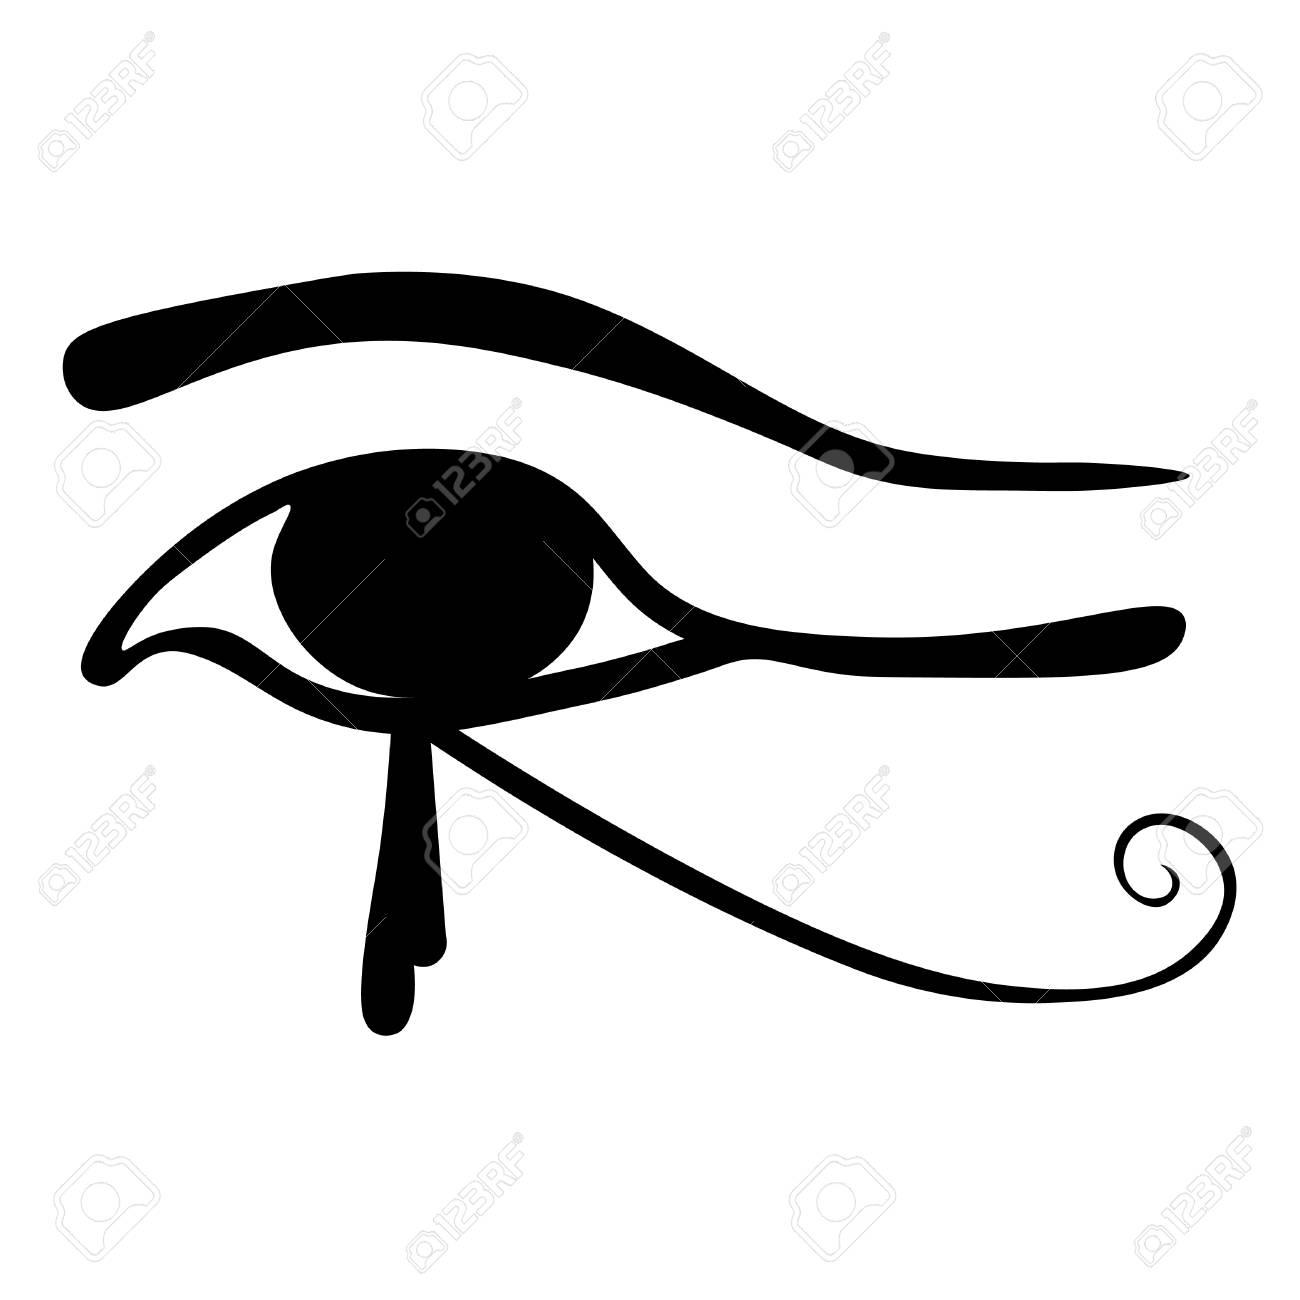 Egyptian Eye Of Horus Symbol Vector Illustration Royalty Free